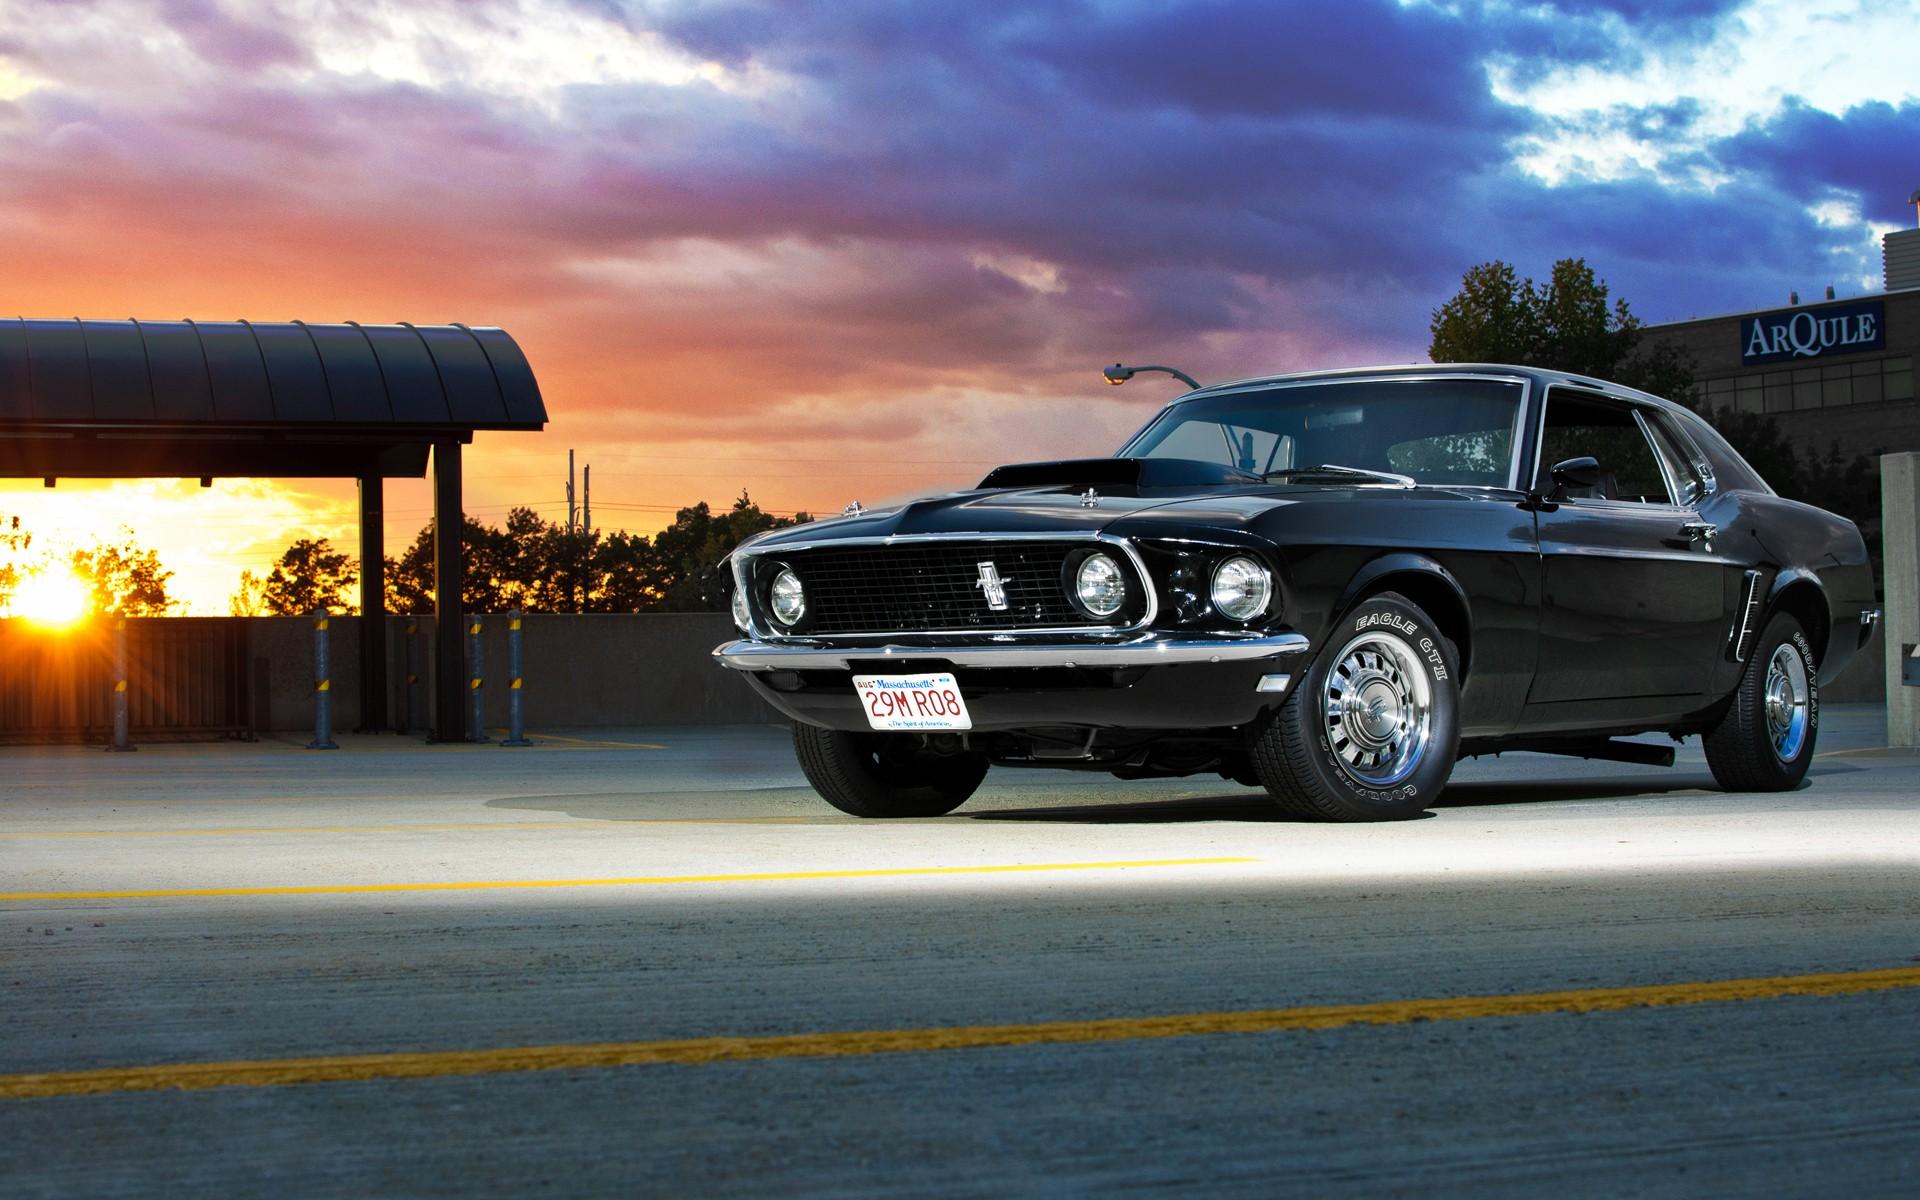 Muscle car wallpaper hd wallpapersafari - Muscle cars wallpaper hd pack ...